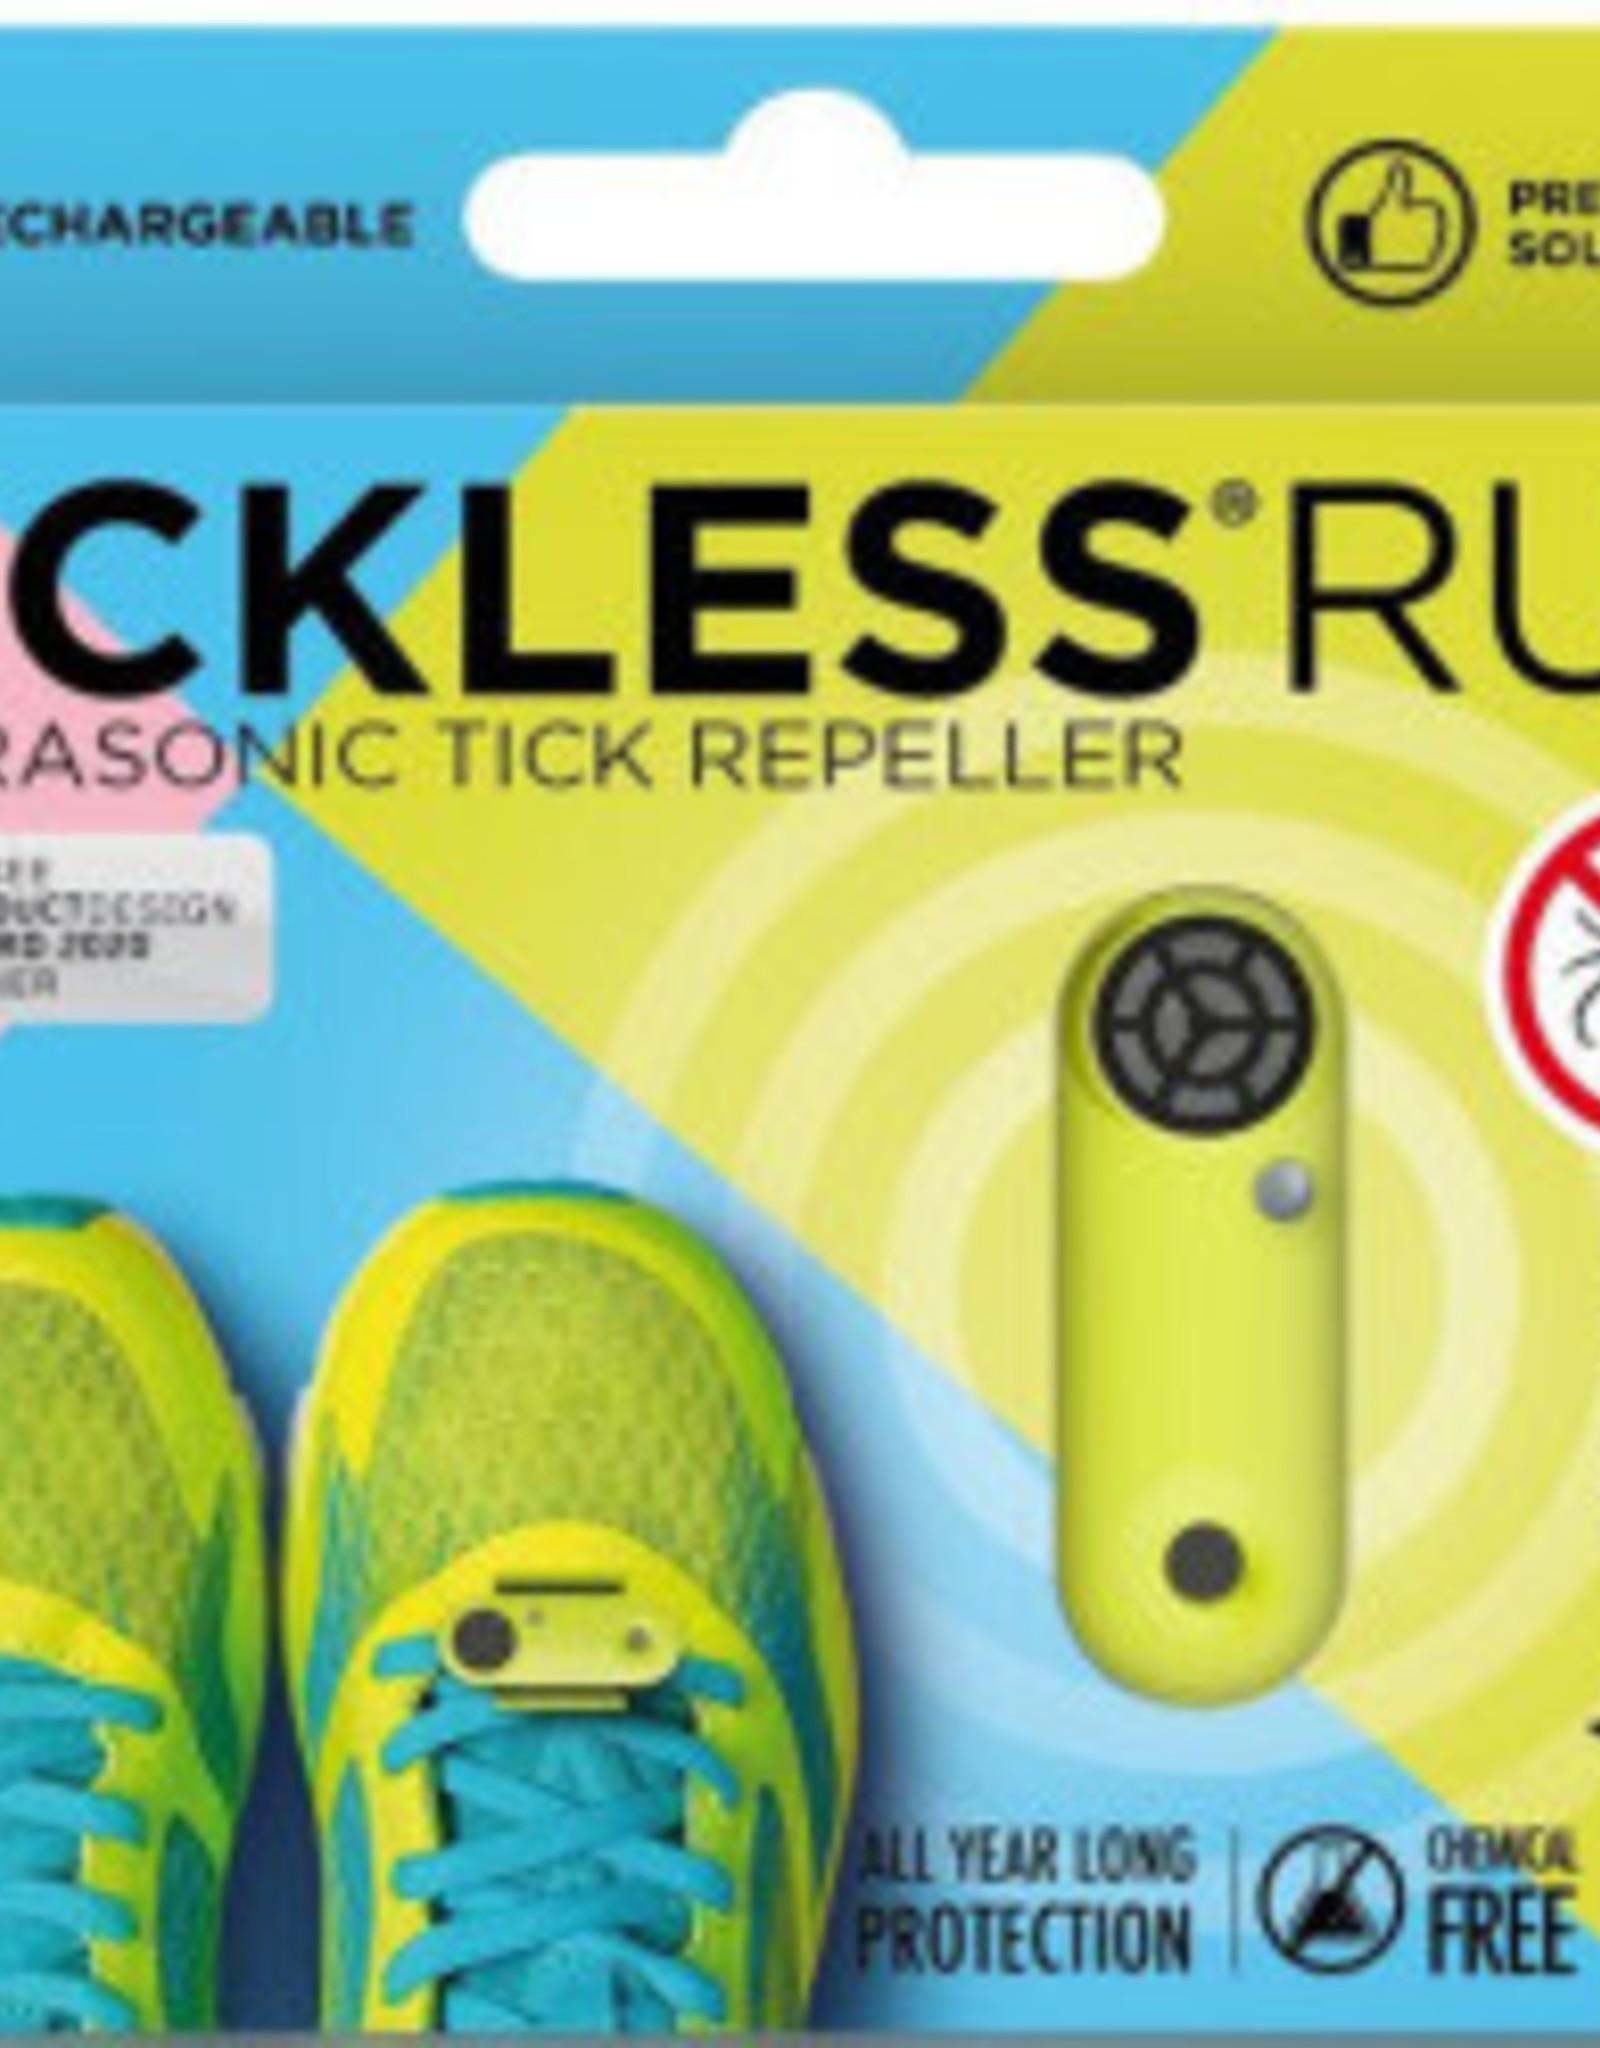 Tickless Tickless Run Neon  Repeller Green Rechargable